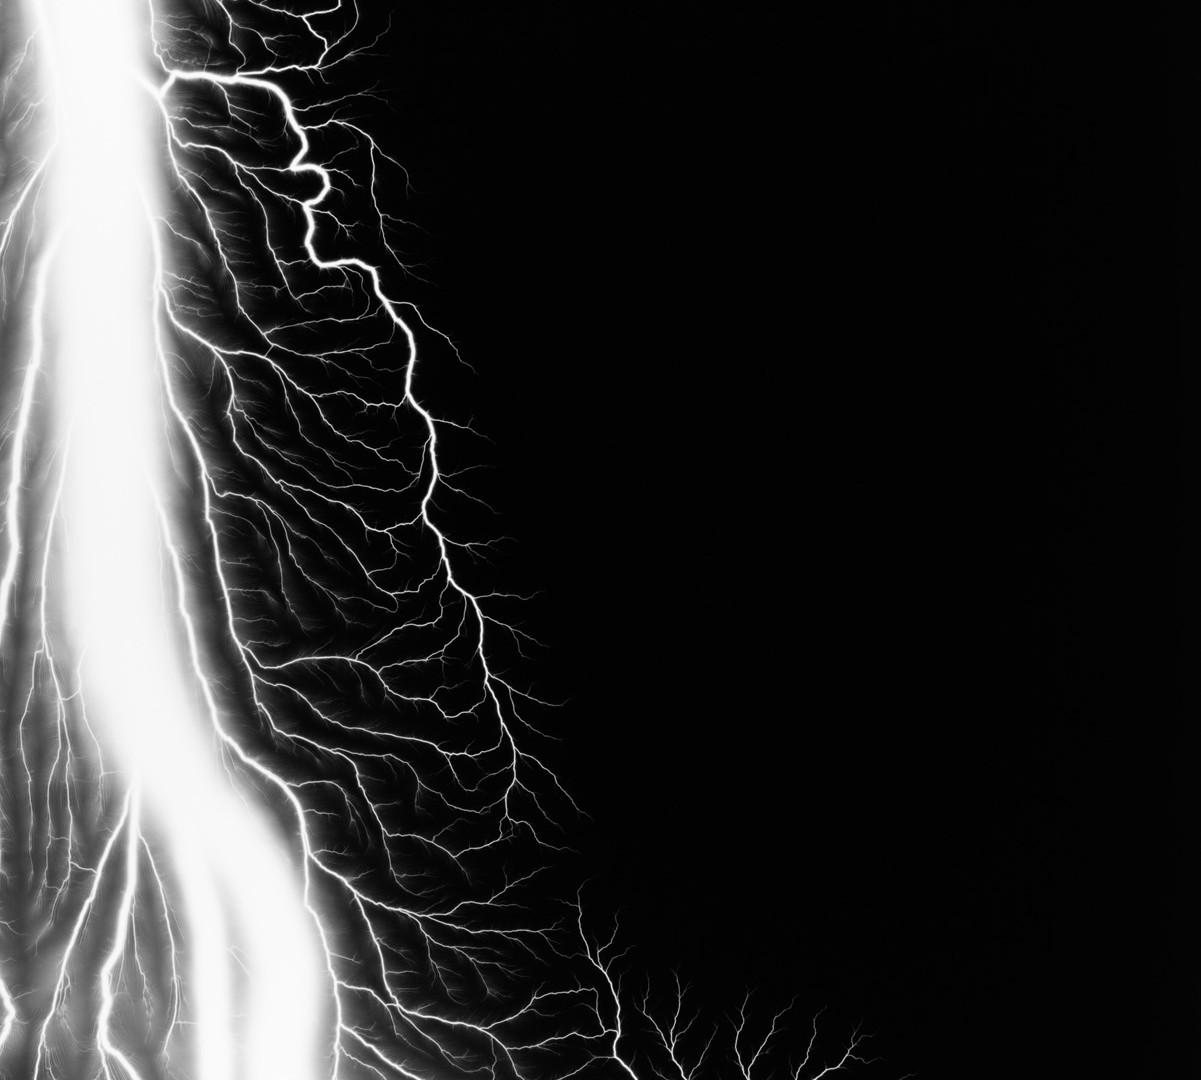 Hiroshi Sugimoto, Lightning Fields 216, 2009